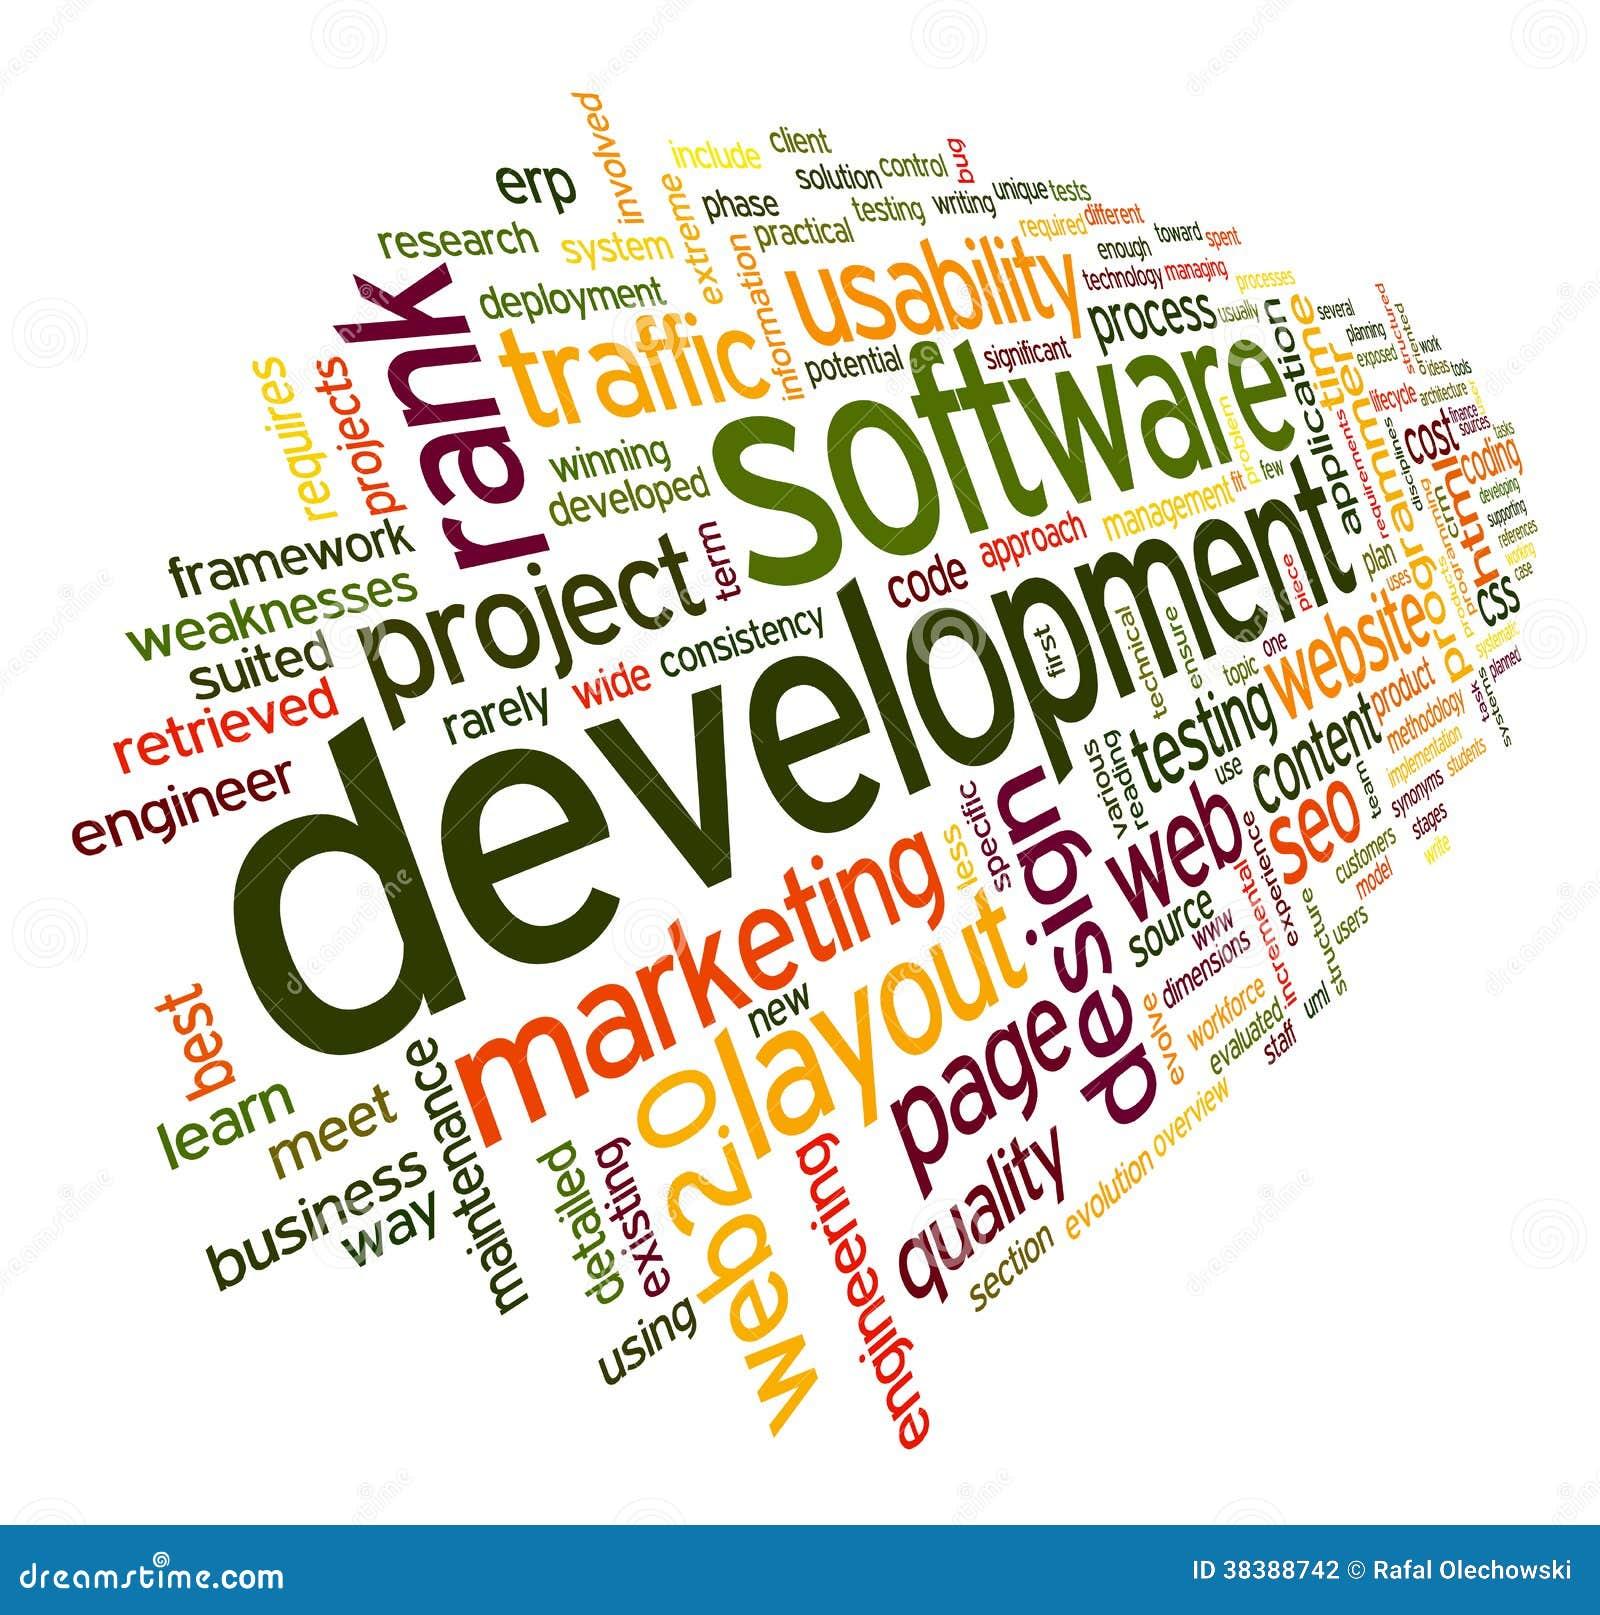 Концепция разработки программного обеспечения в облаке бирки